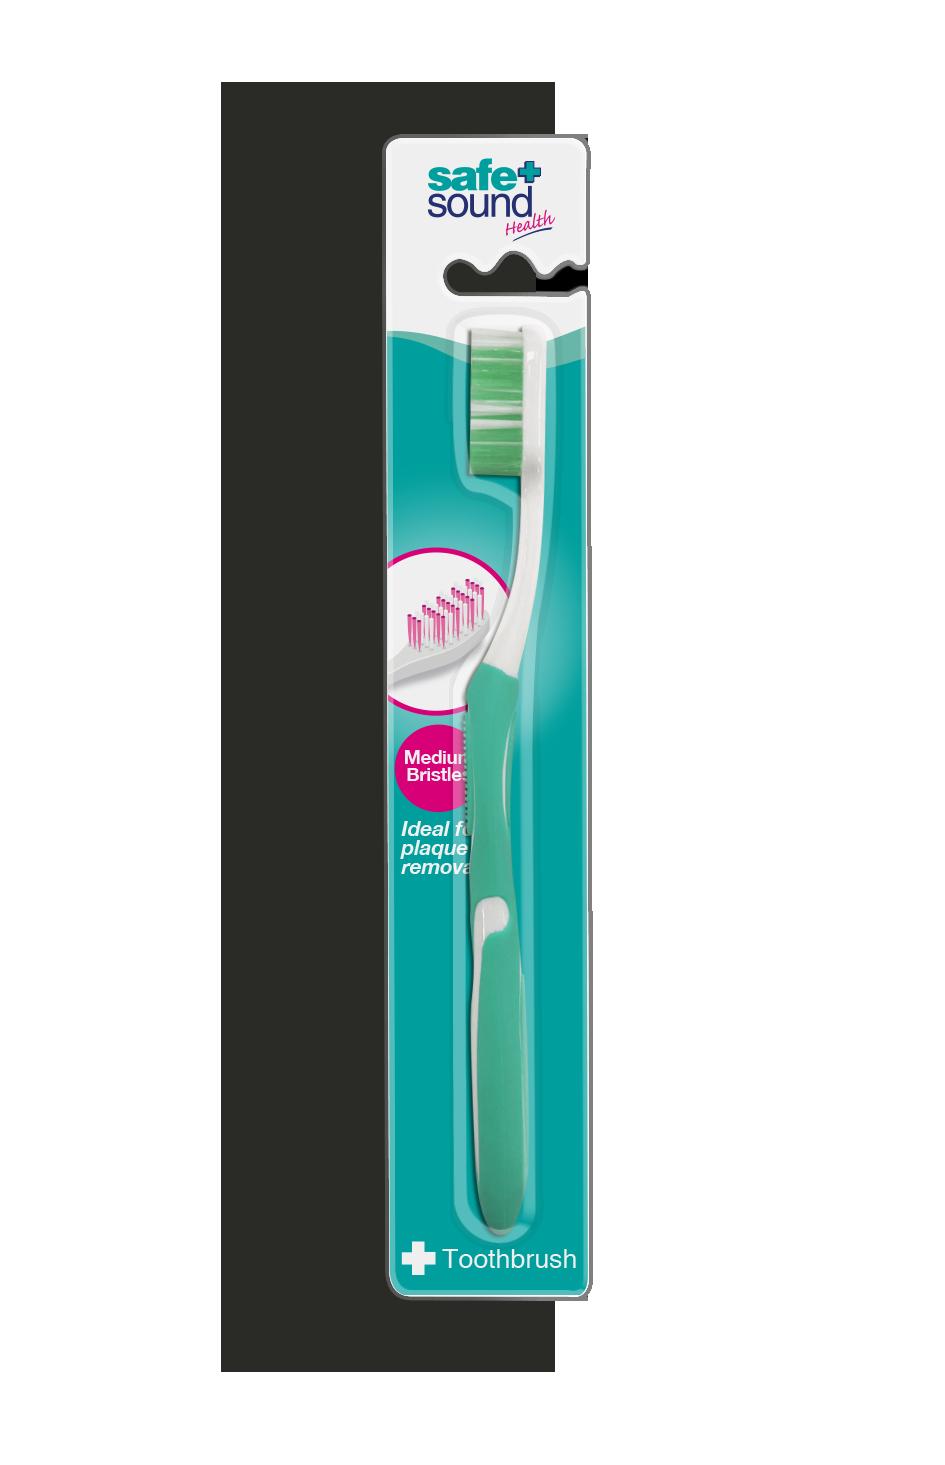 Safe and Sound Health Medium Bristle Toothbrush